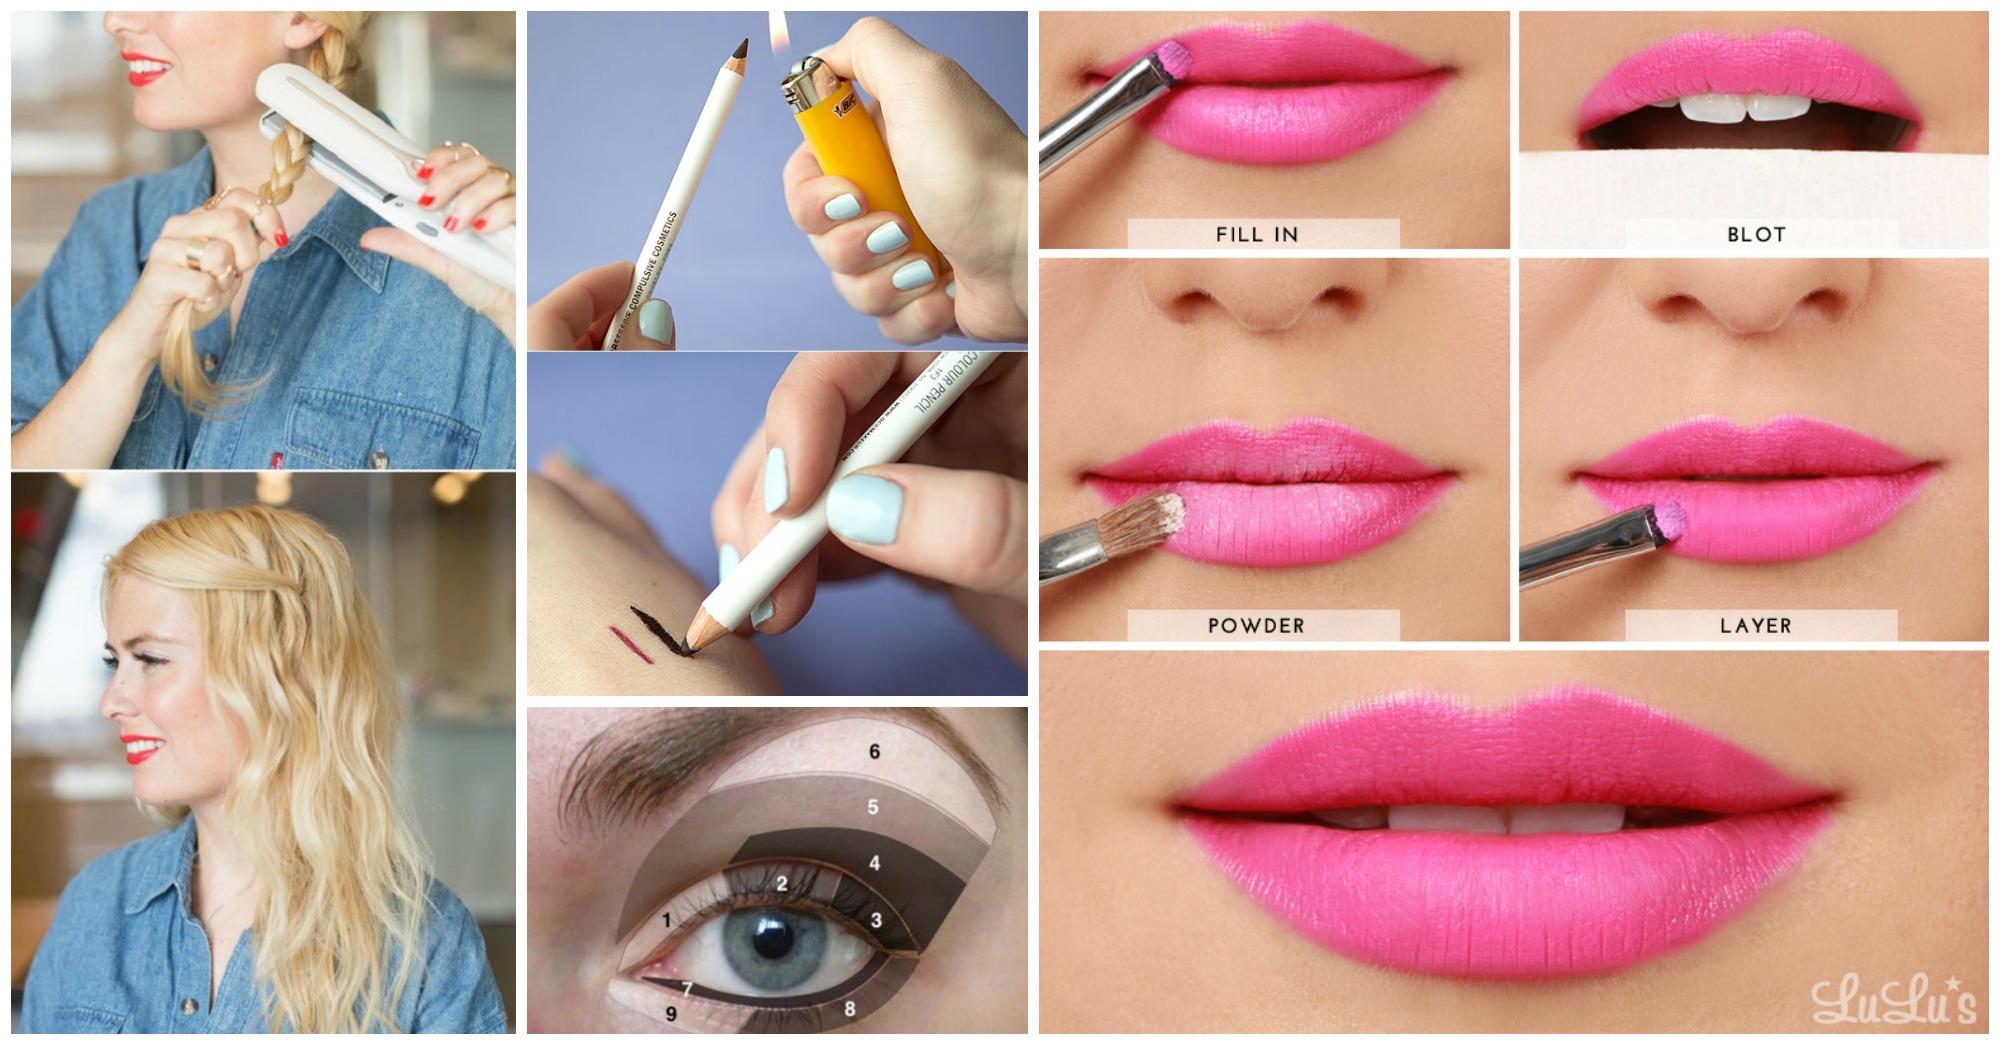 10 Fantastic Beauty Hacks You Should Not Miss